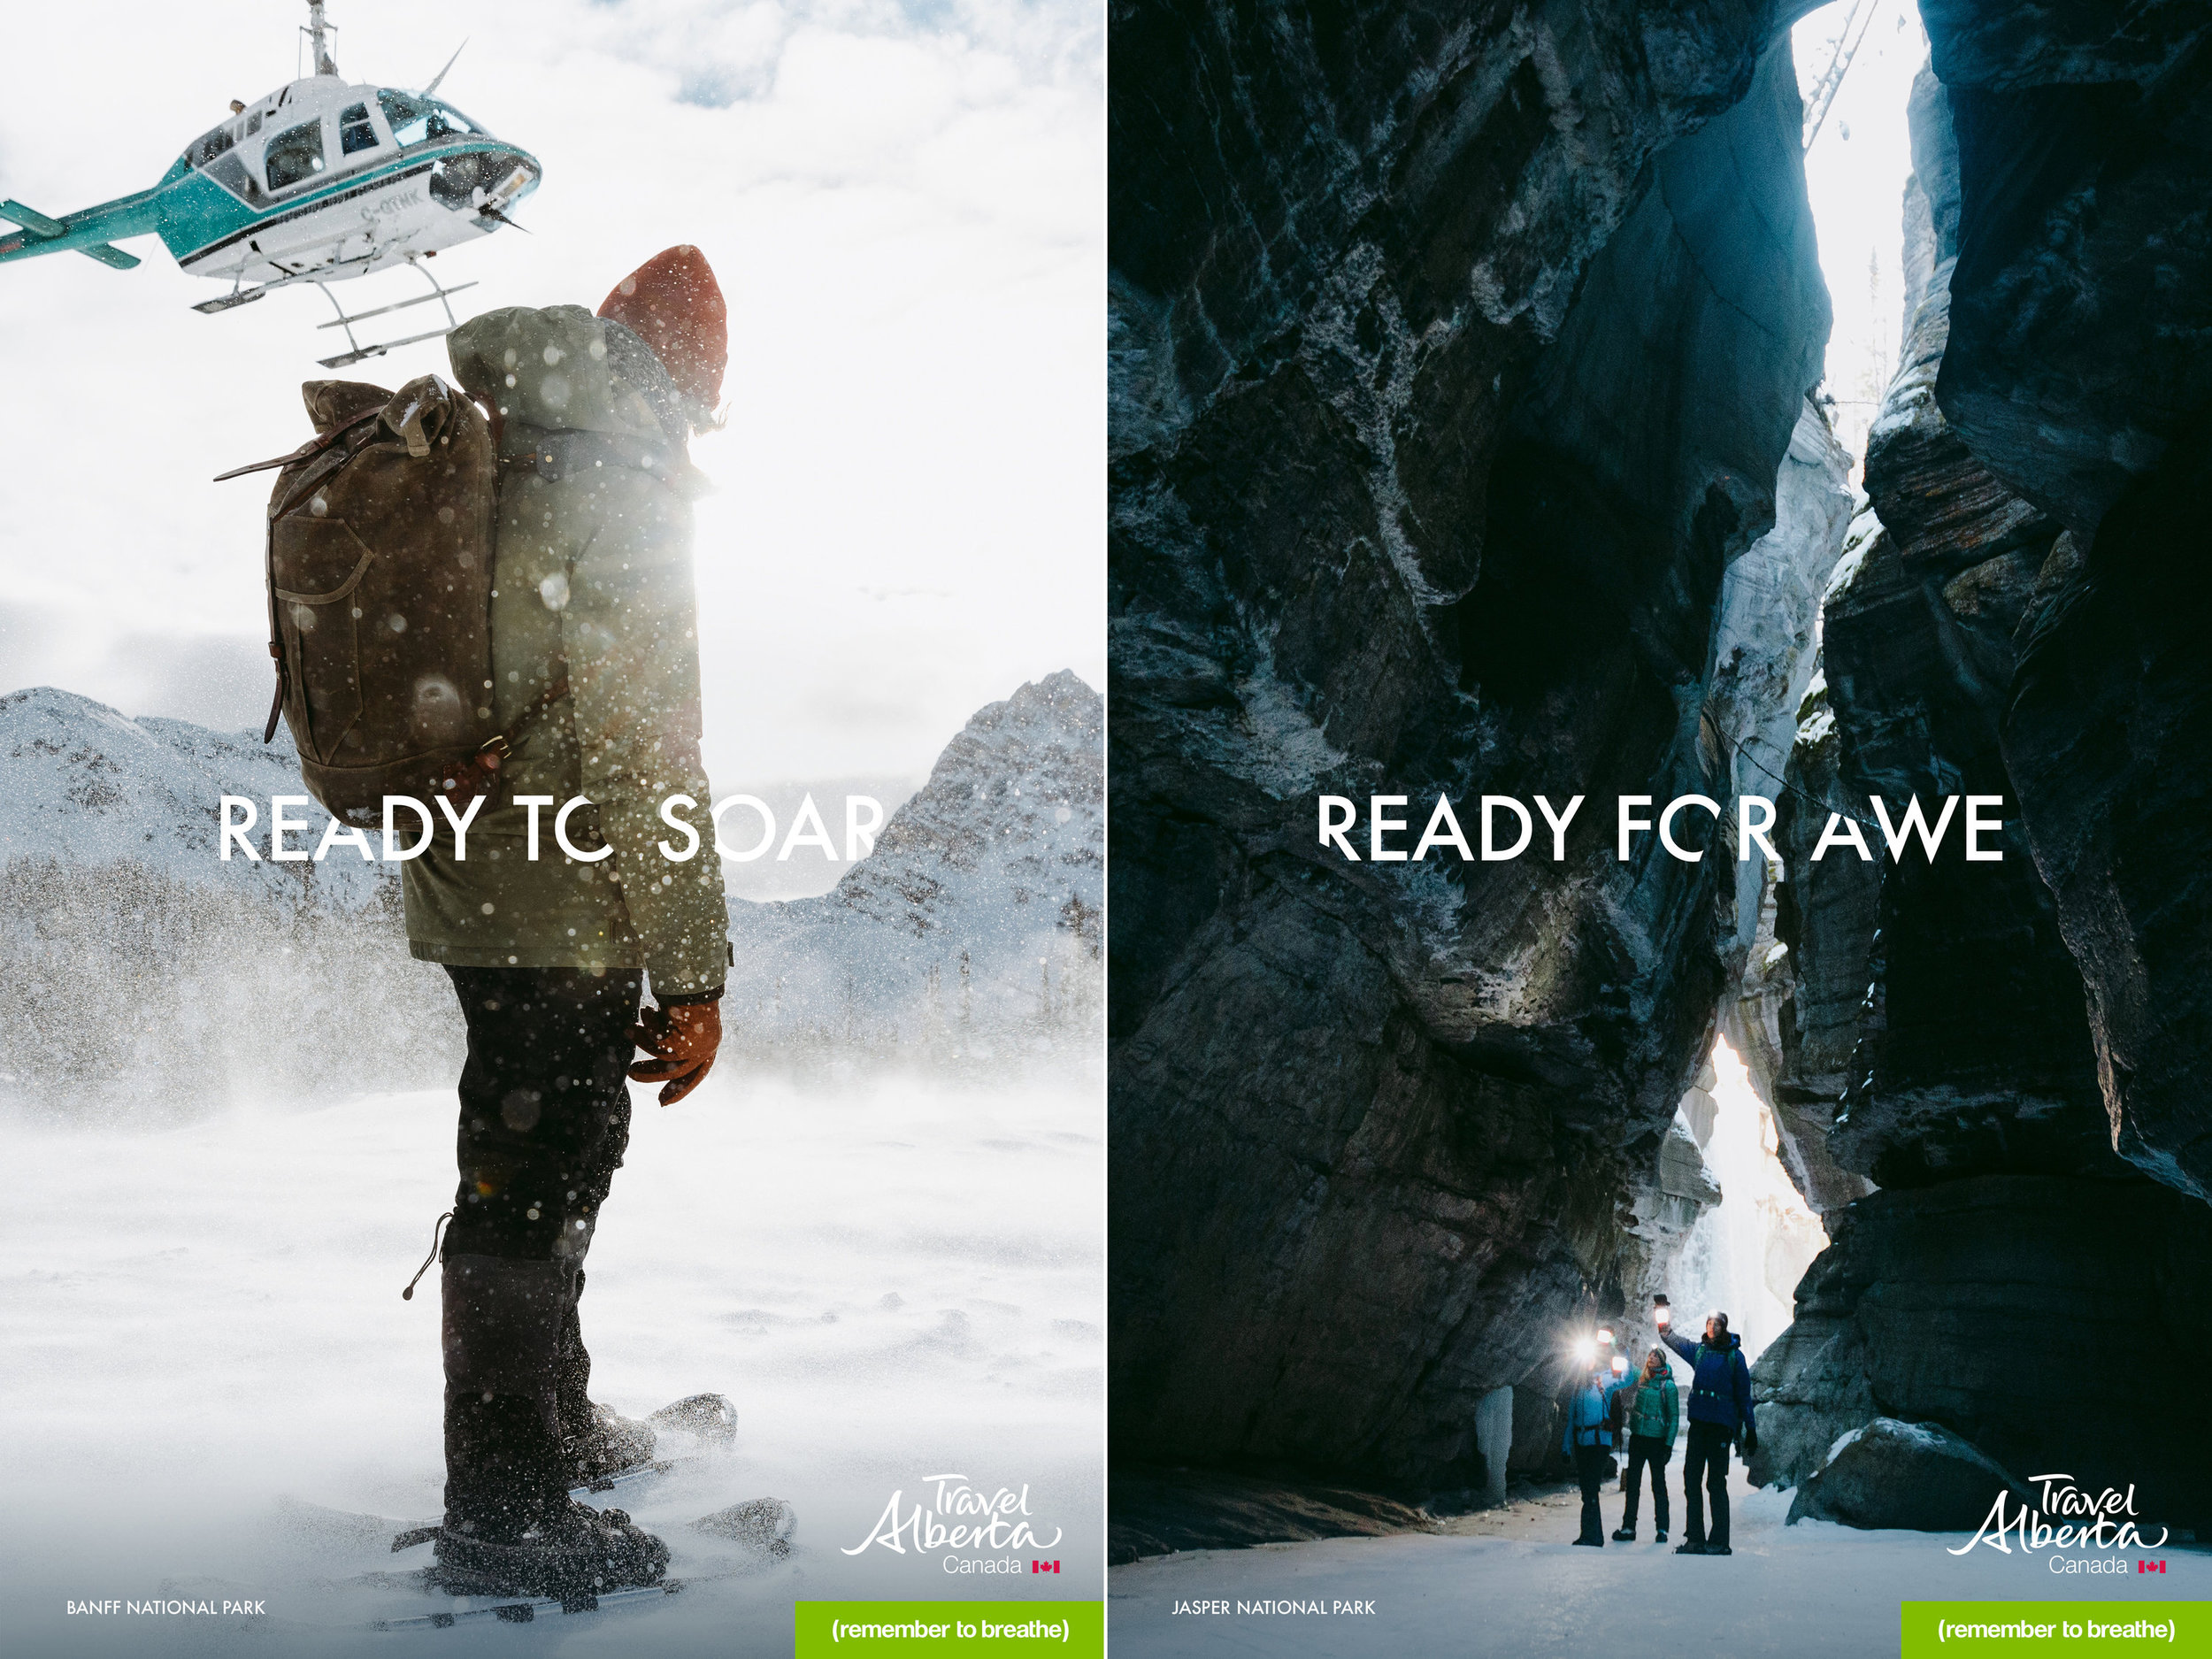 MikeSeehagel-TravelAlberta-Ready-Rebrand_Canada-LifestylePhotography_01-4.jpg